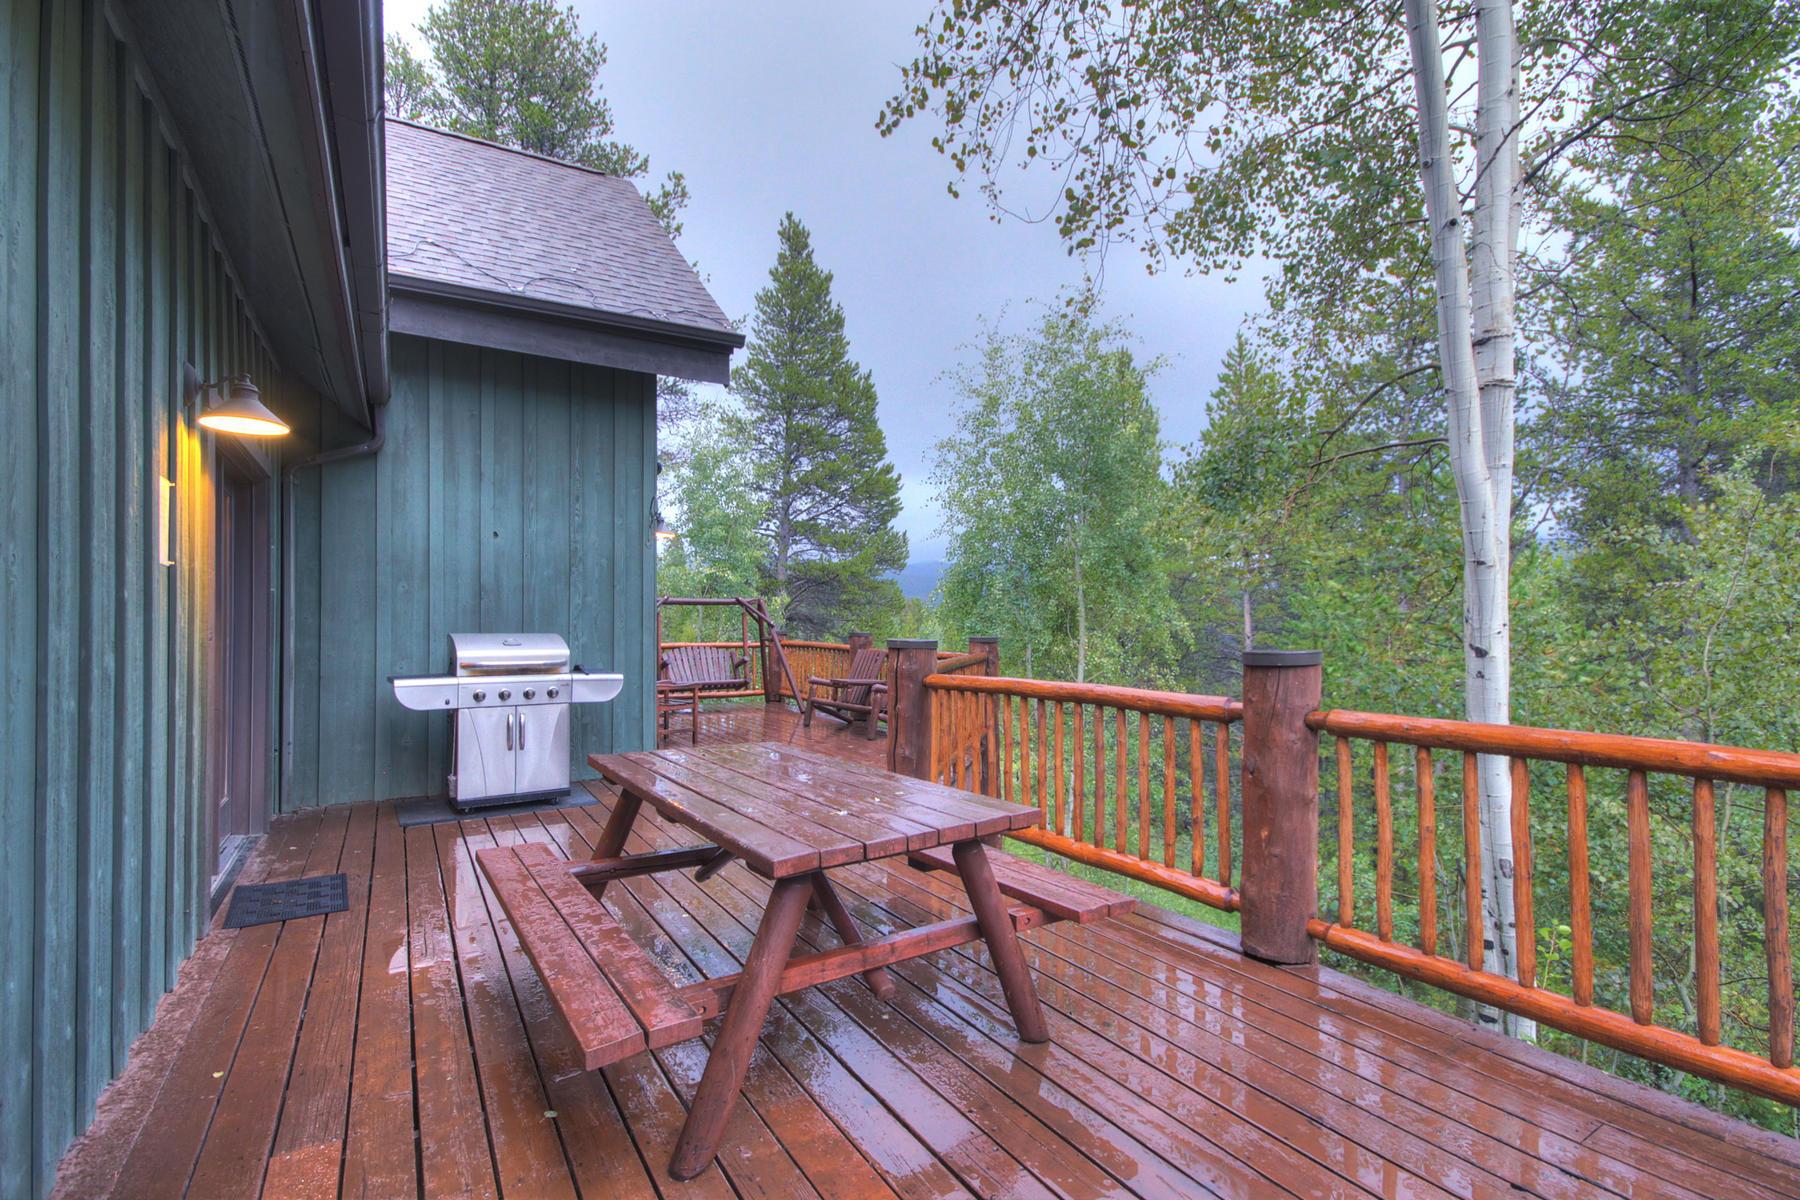 Additional photo for property listing at Nordic Ski Mountain Home 113 Willow Lane Breckenridge, Colorado 80424 United States